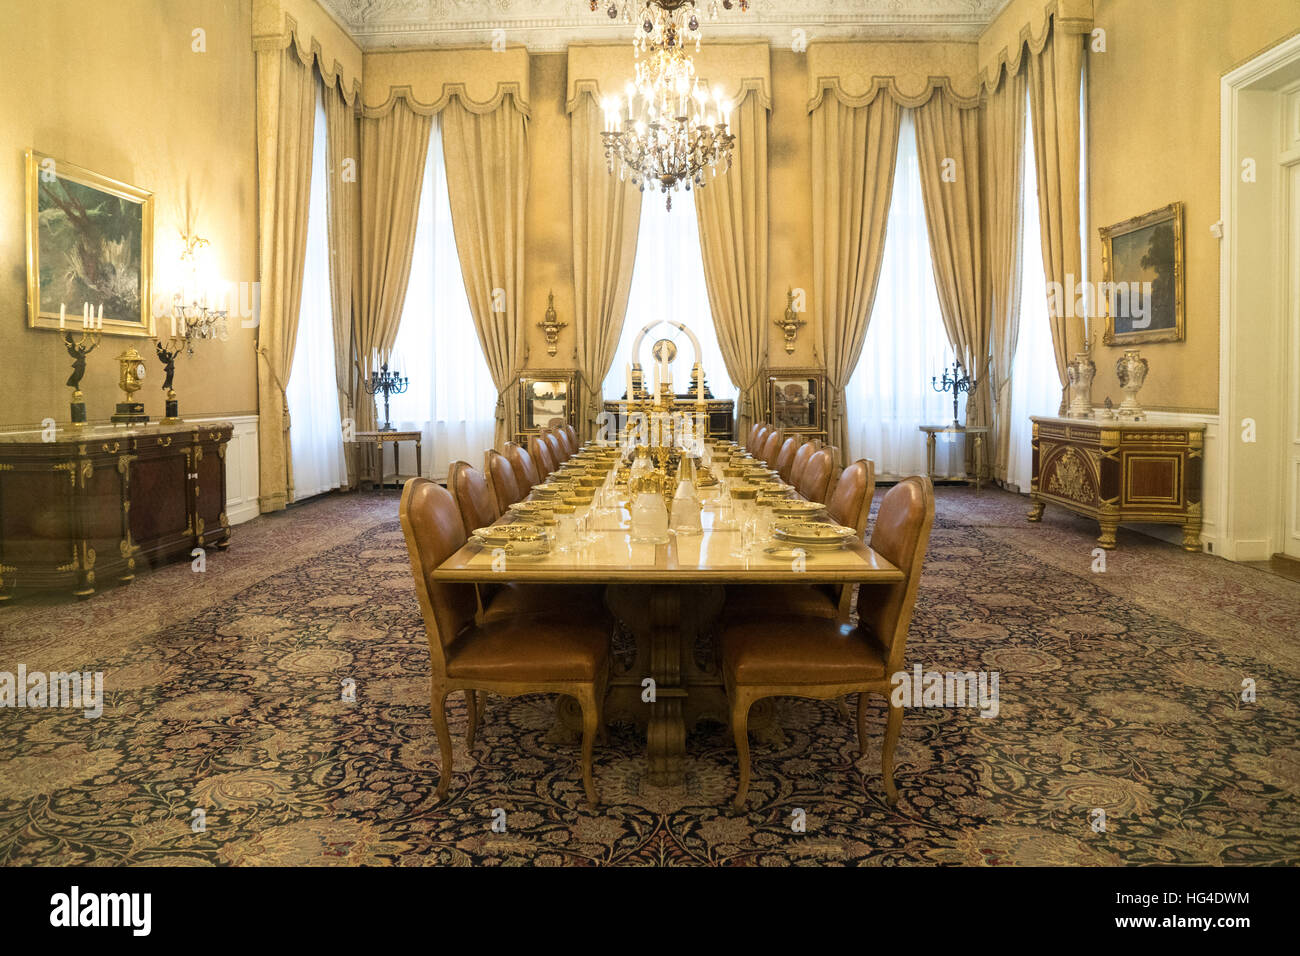 dining room, white palace, the last shah's summer palace, sa'ad